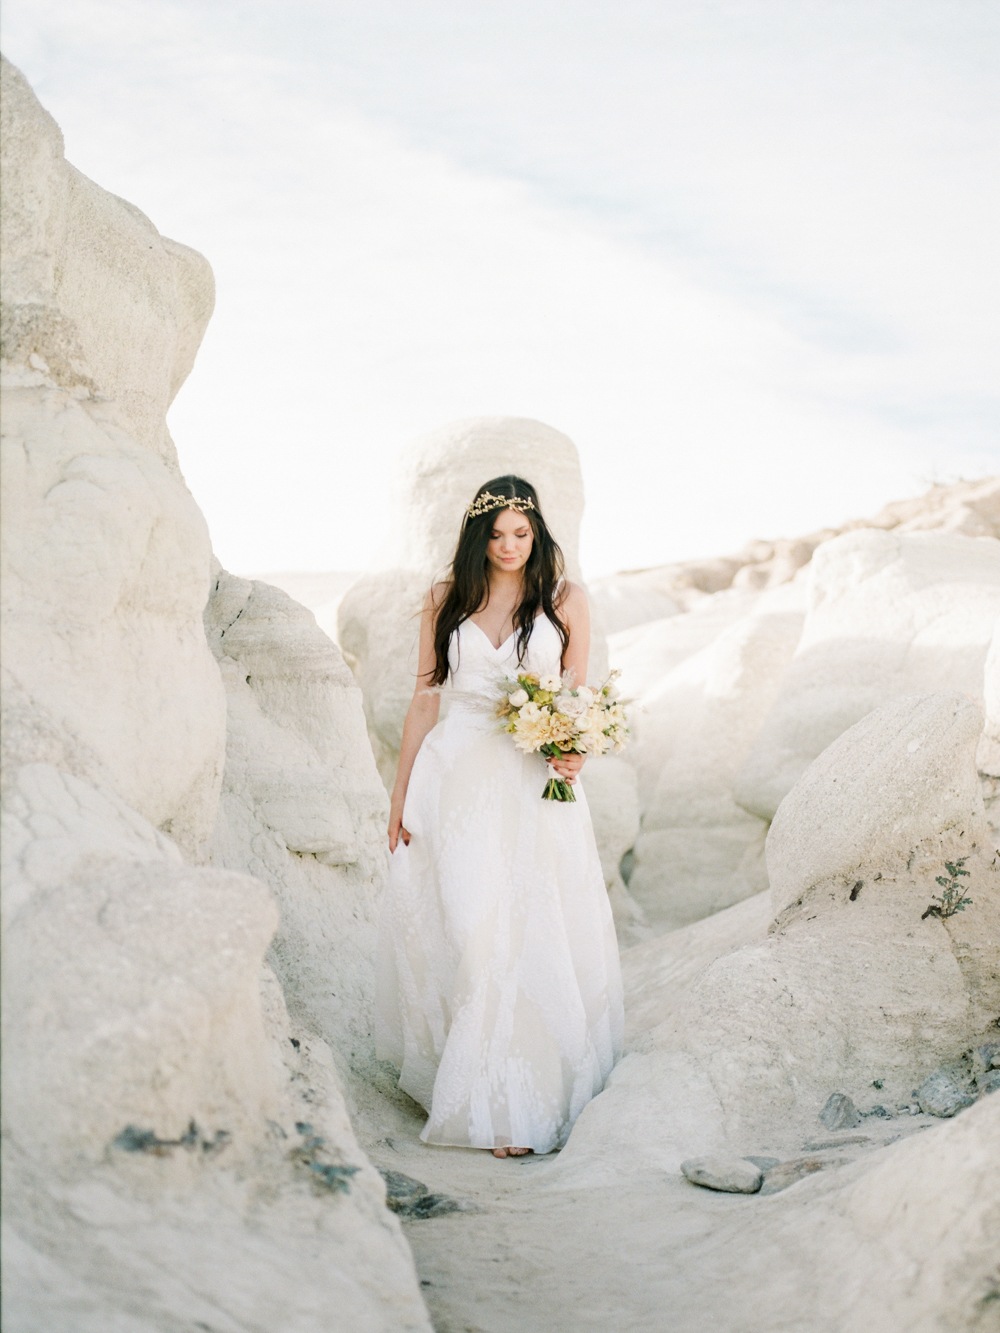 Christine Gosch - destination film photographer - houston wedding photographer - fine art film photographer - elopement photographer - destination wedding - understated wedding - simple beautiful wedding photography-40.jpg